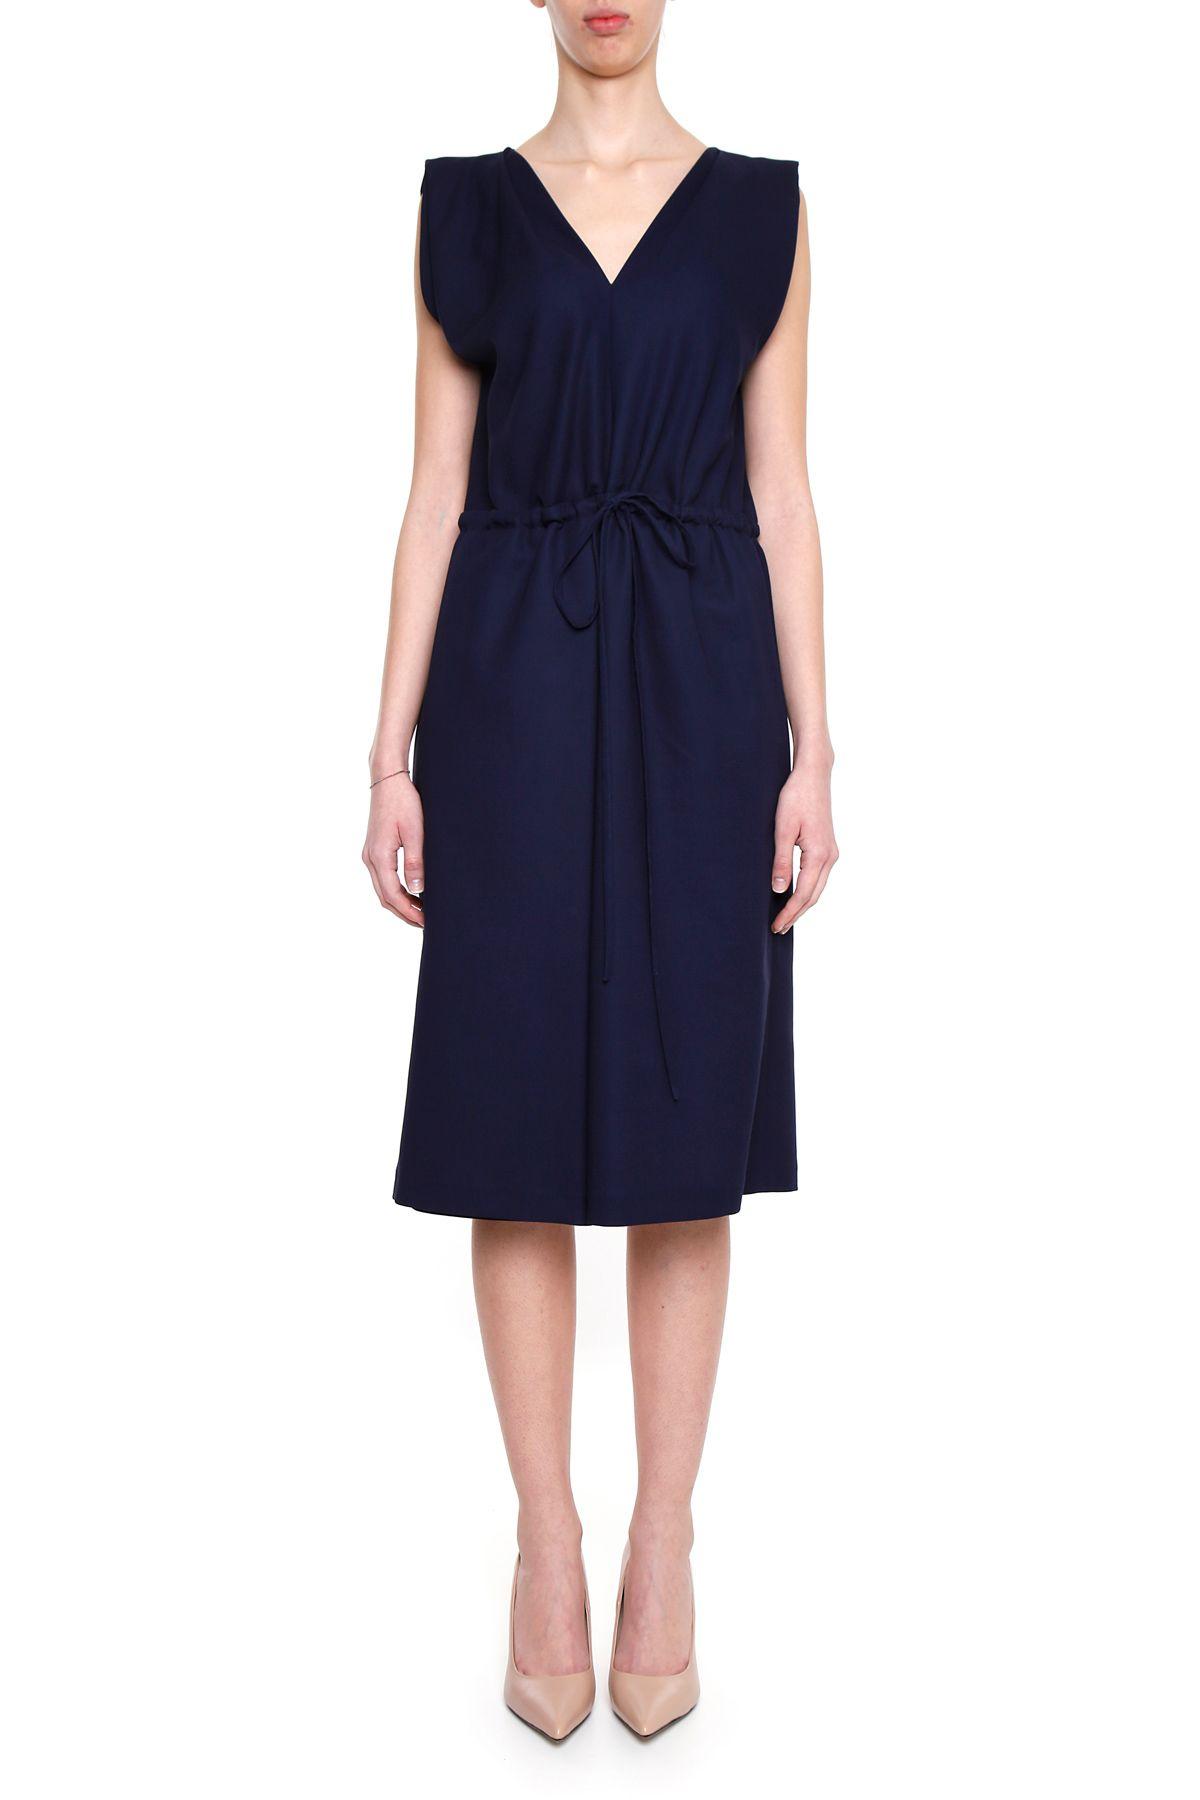 Carosello Dress